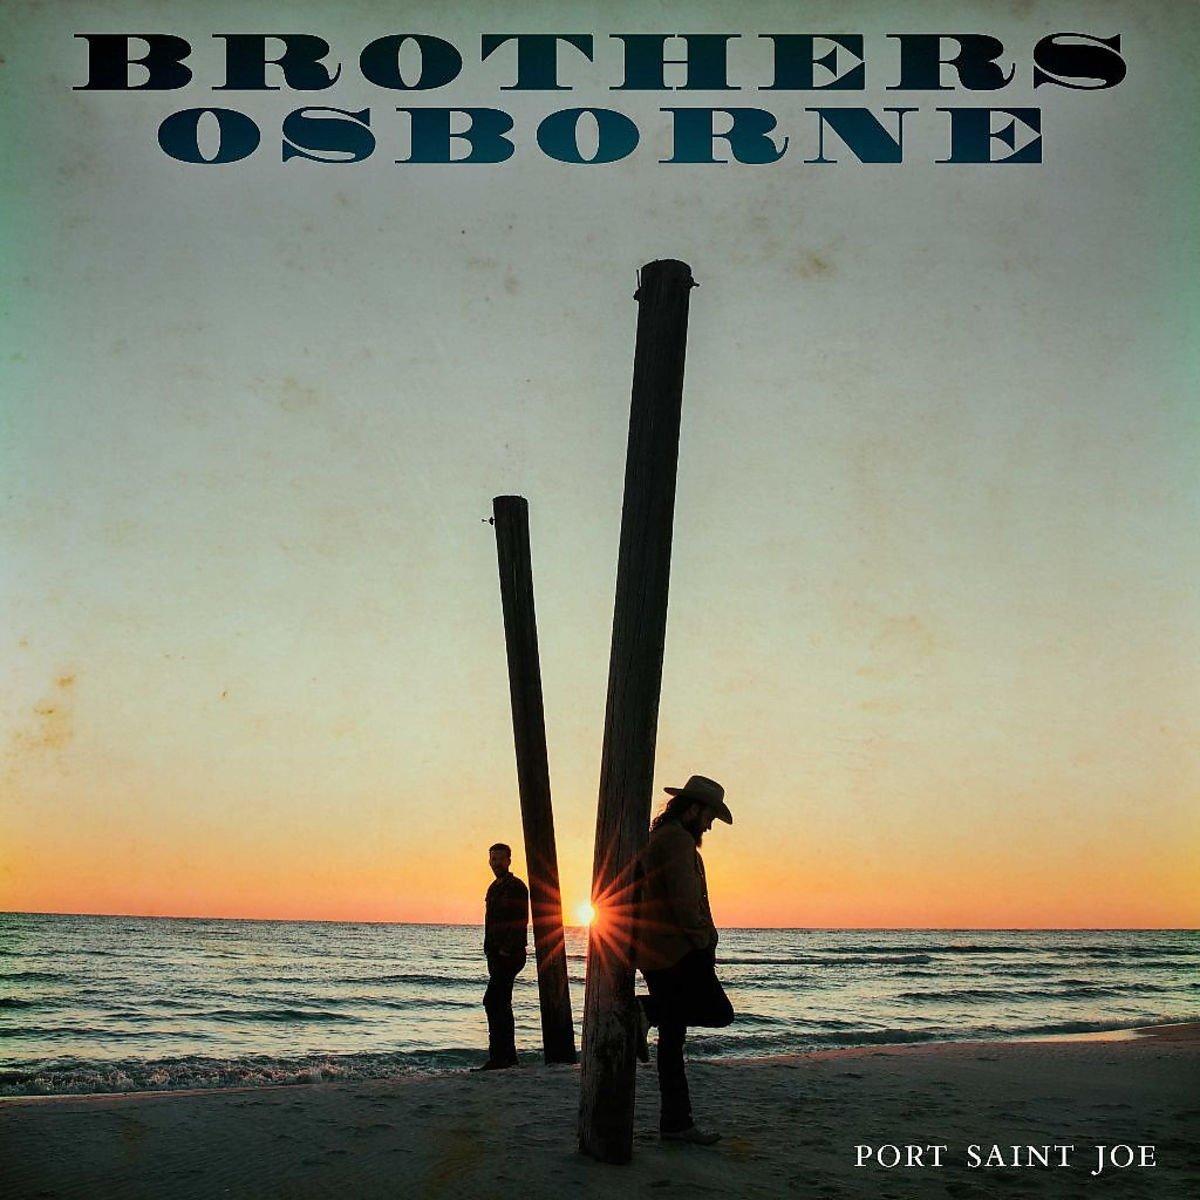 Port Saint Joe  Brothers Osborne   LINKS   Official Site   Facebook   Twitter   Instagram    LISTEN ON   Spotify   Apple Music